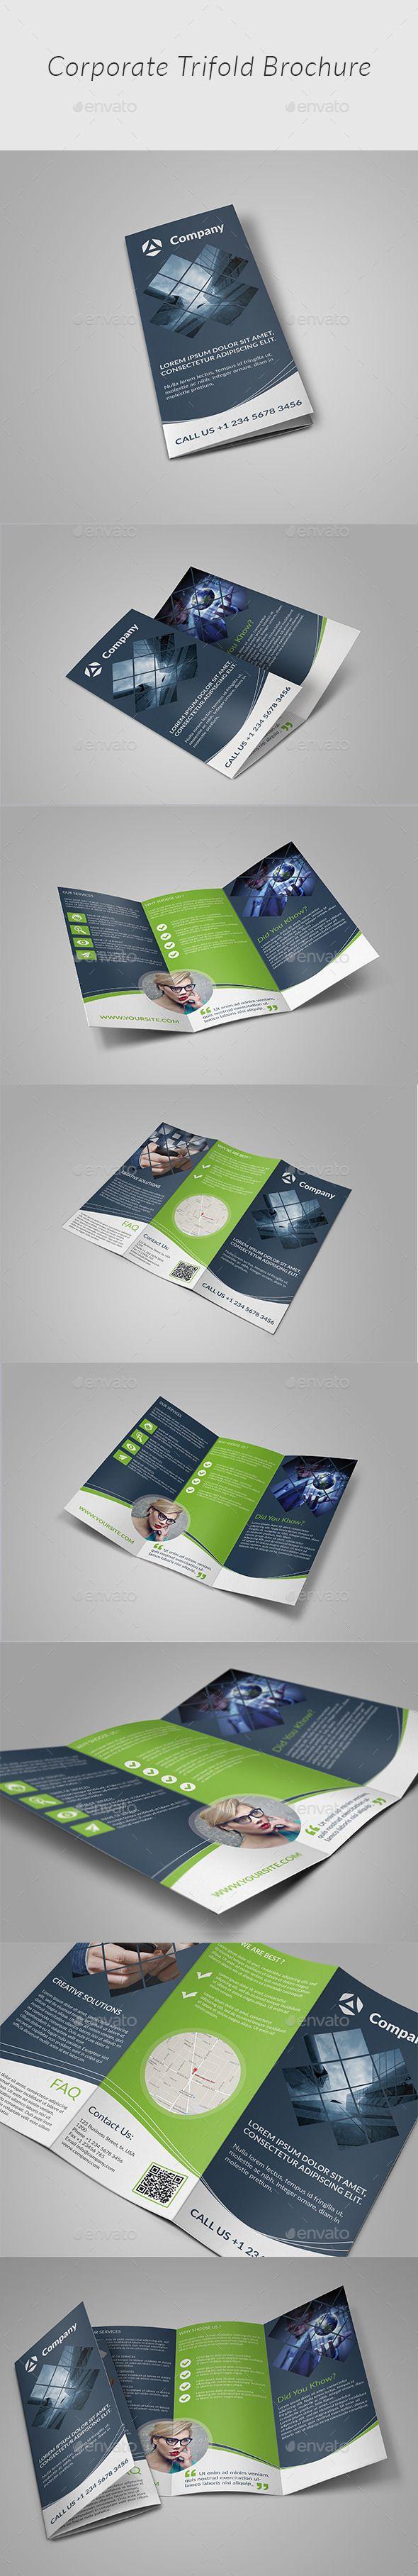 Tri-fold Brochure-Multipurpose Template #design Download: http://graphicriver.net/item/trifold-brochuremultipurpose/12451088?ref=ksioks